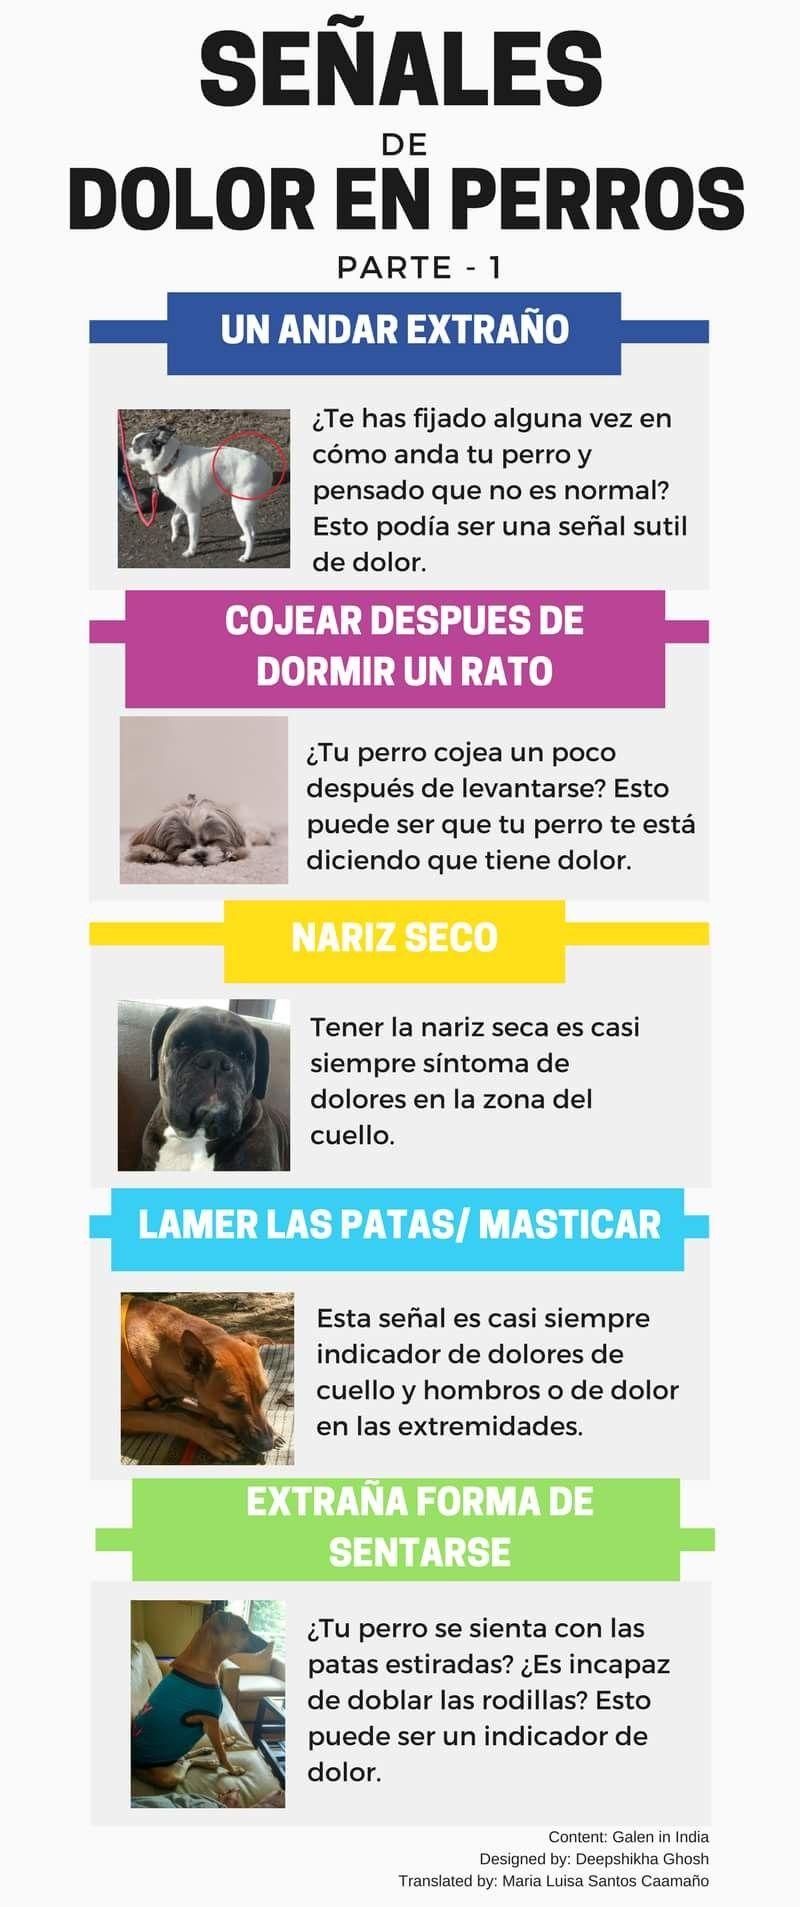 Dato interesante | Anatomía animal | Pinterest | Datos interesantes ...